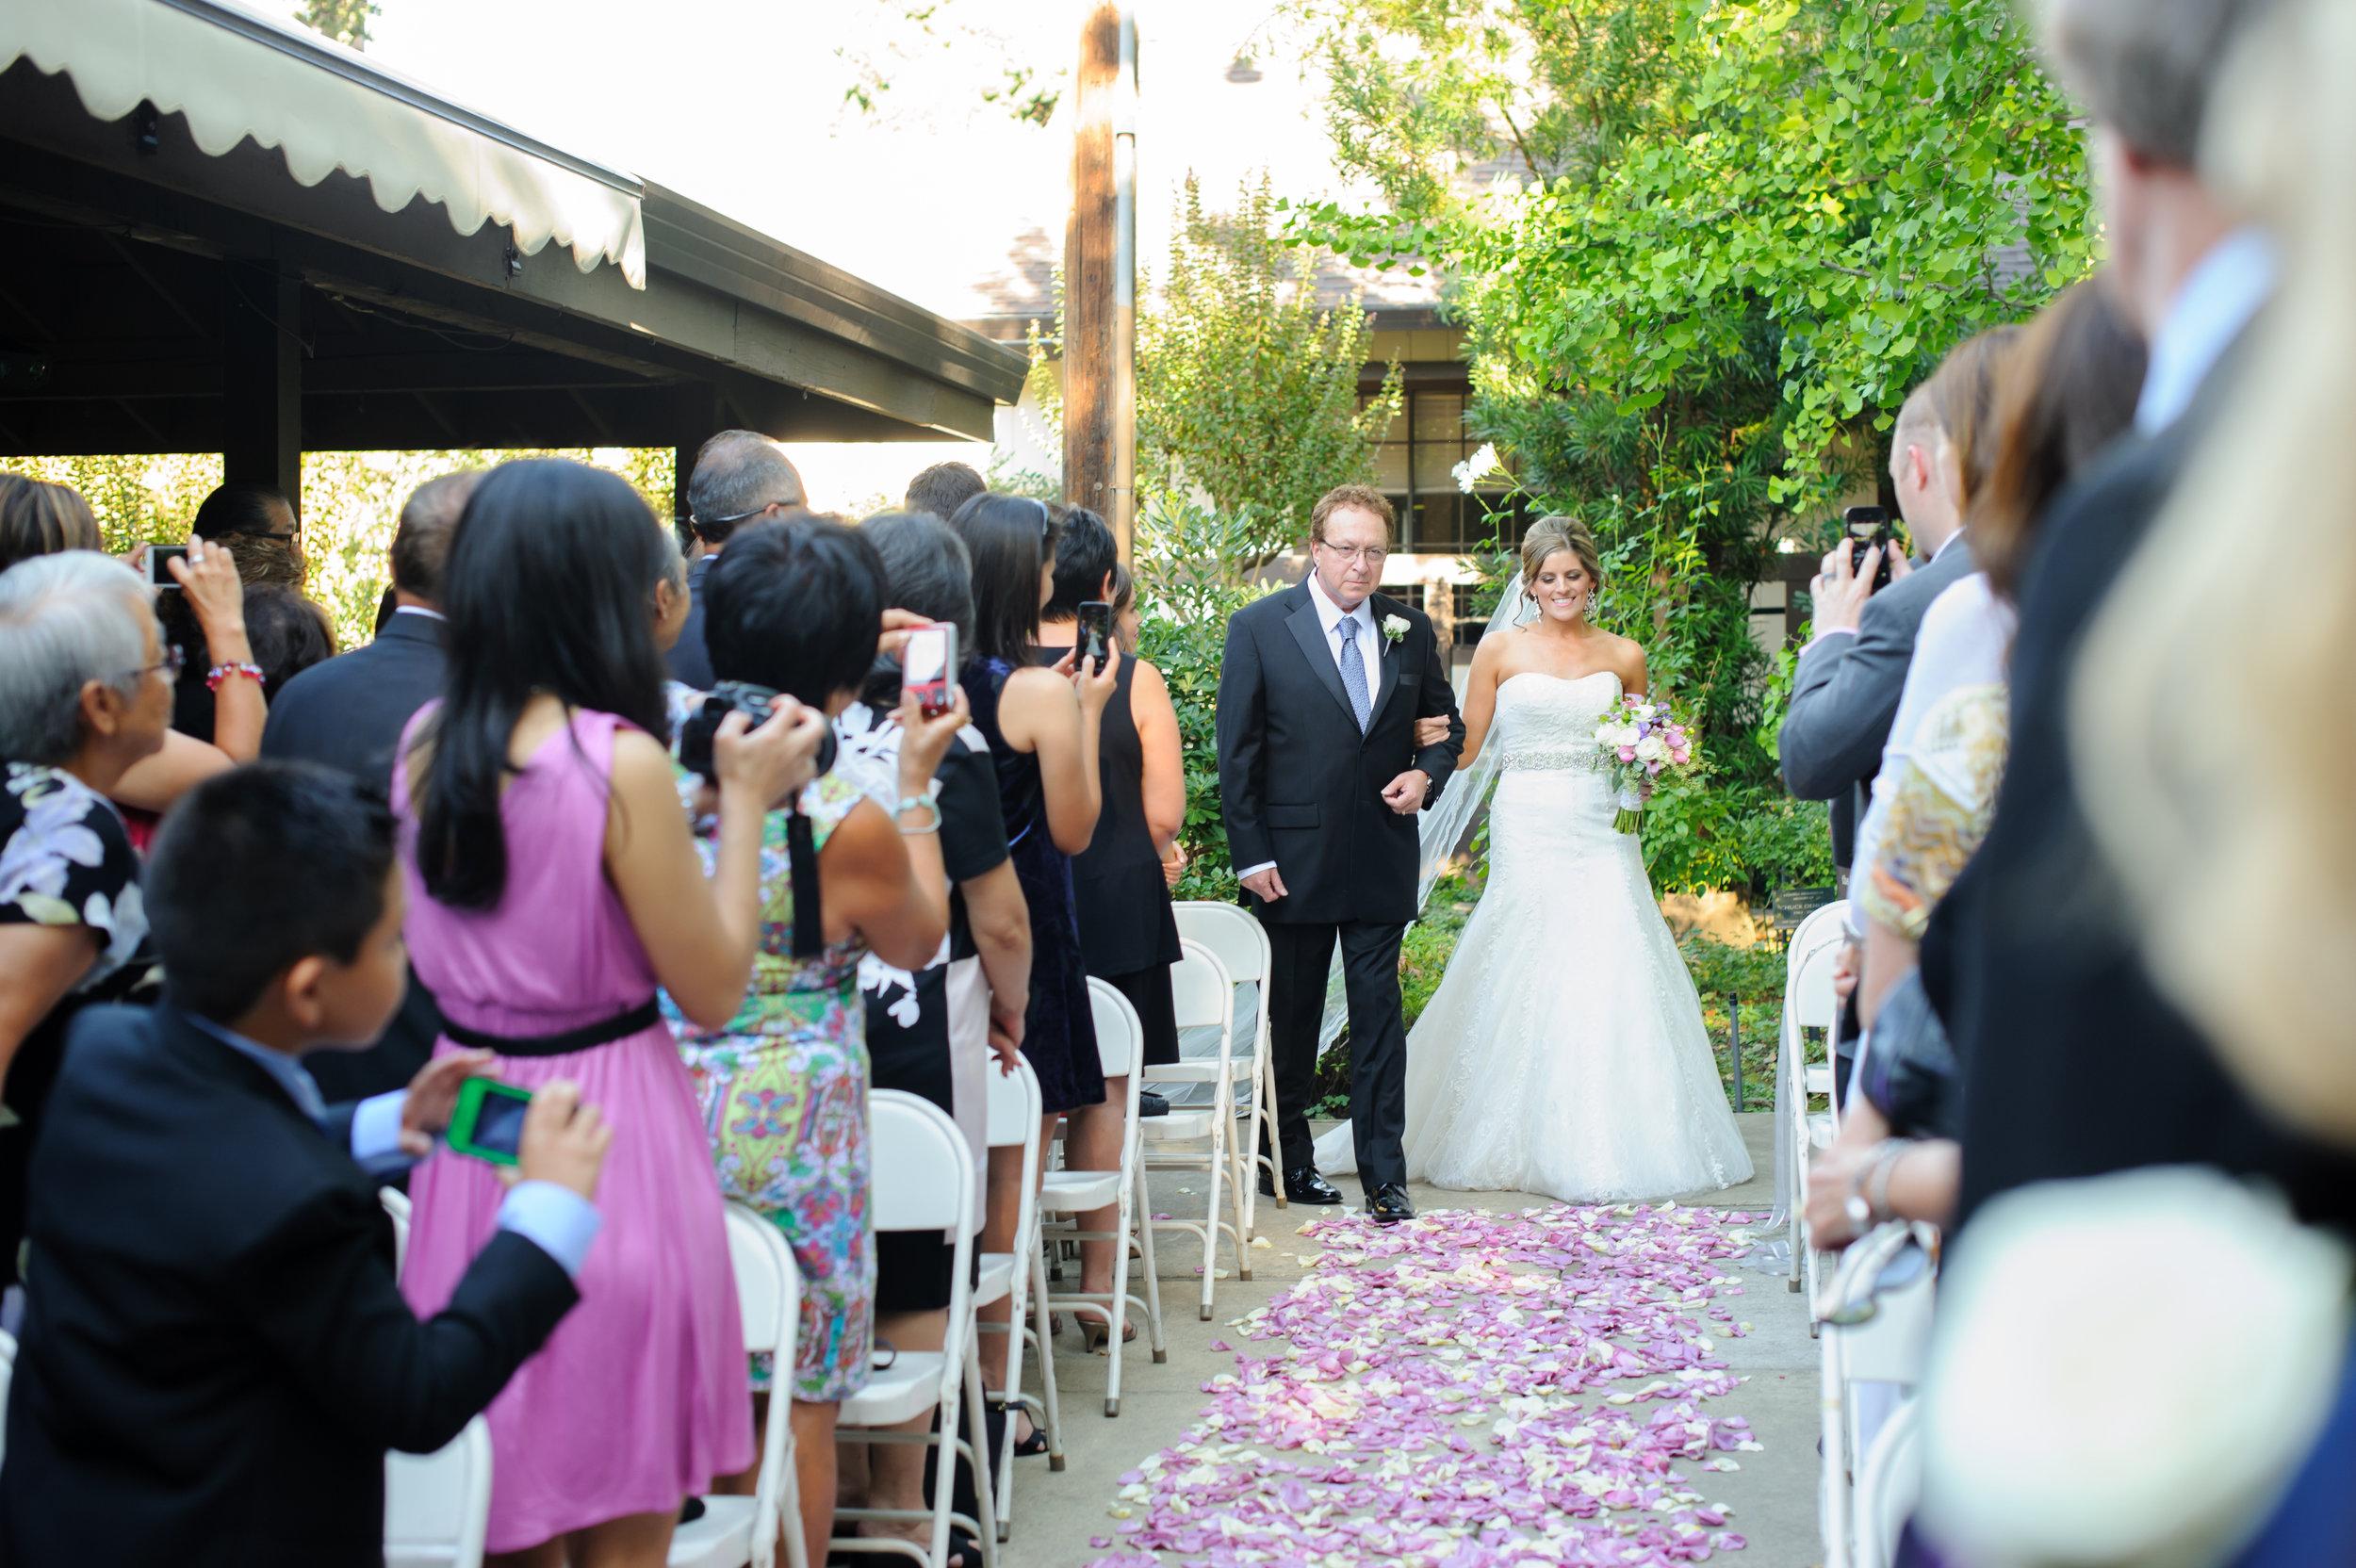 susan-brad-011-sacramento-wedding-photographer-katherine-nicole-photography.JPG